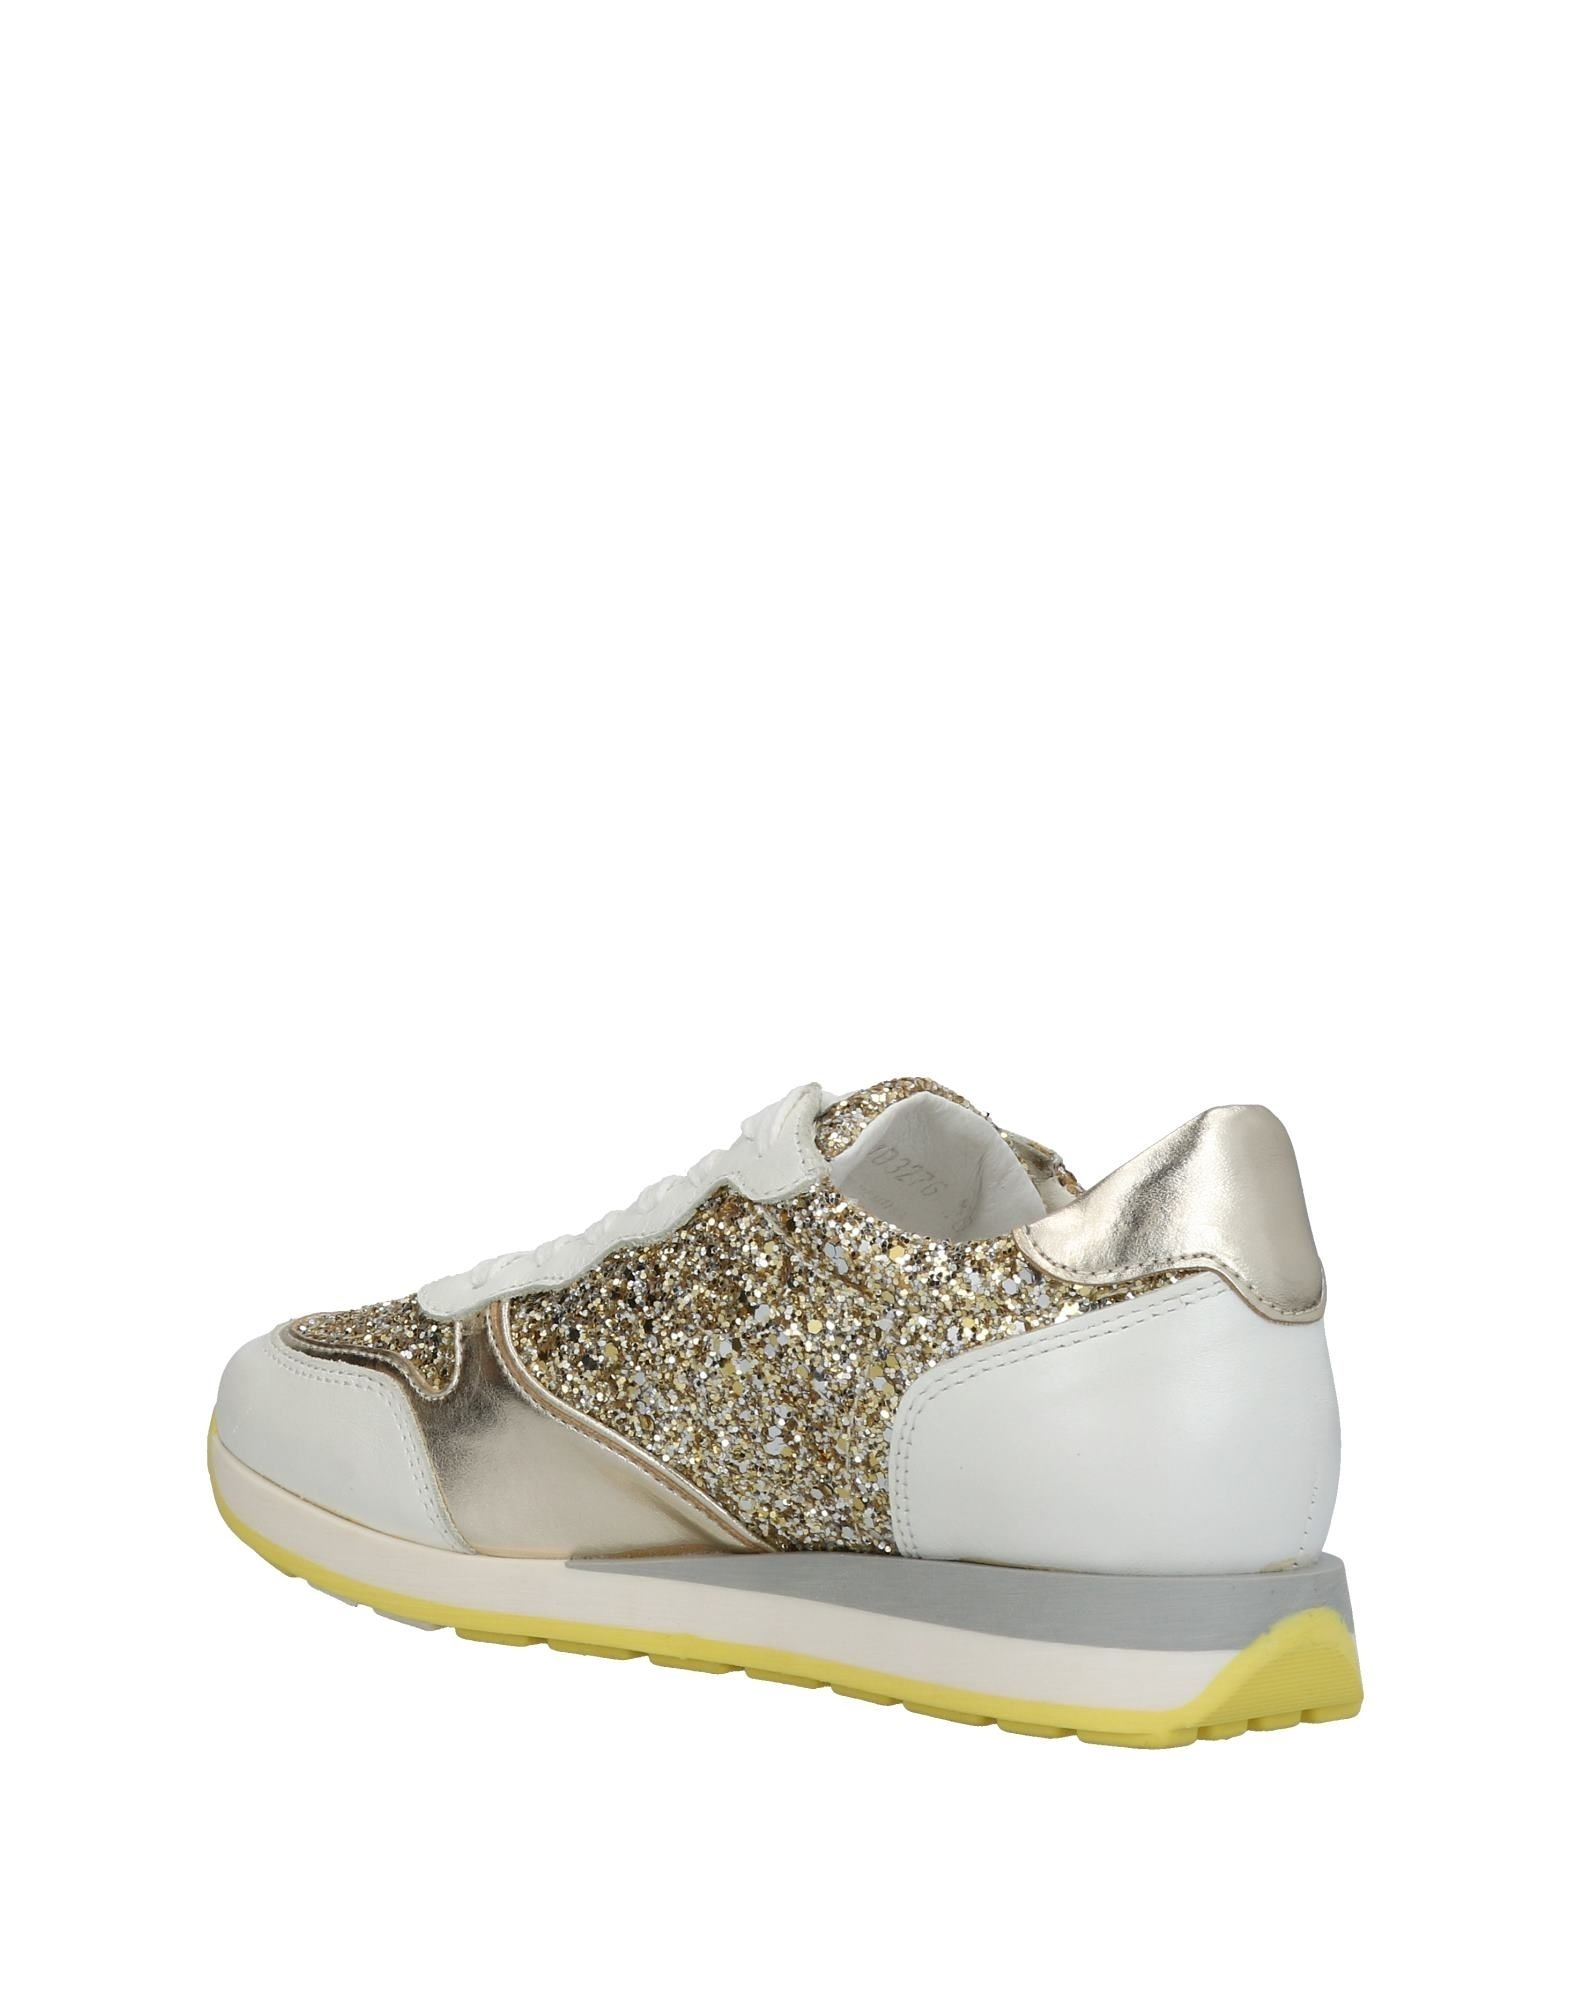 Sneakers Docksteps Femme - Sneakers Docksteps sur